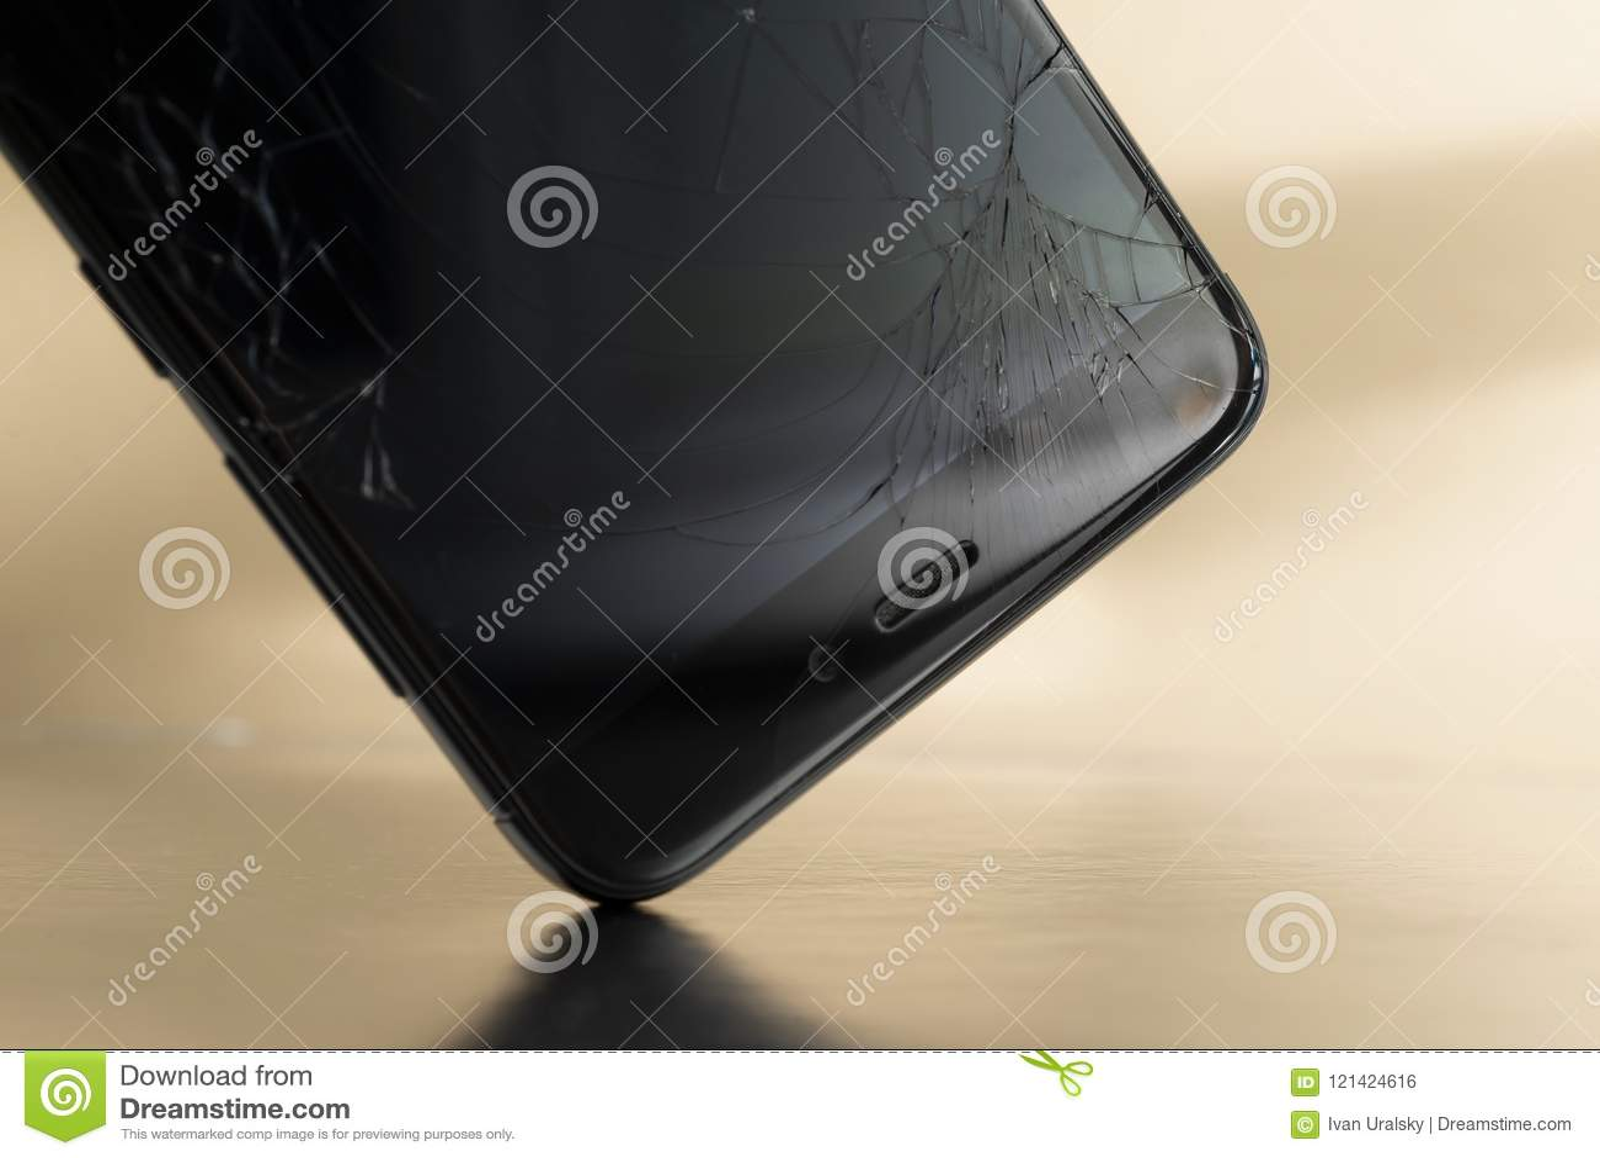 Minsk Belarus Jule 13 2018 Shattered Display Of The Phone Xiaomi Redmi 3 Pro